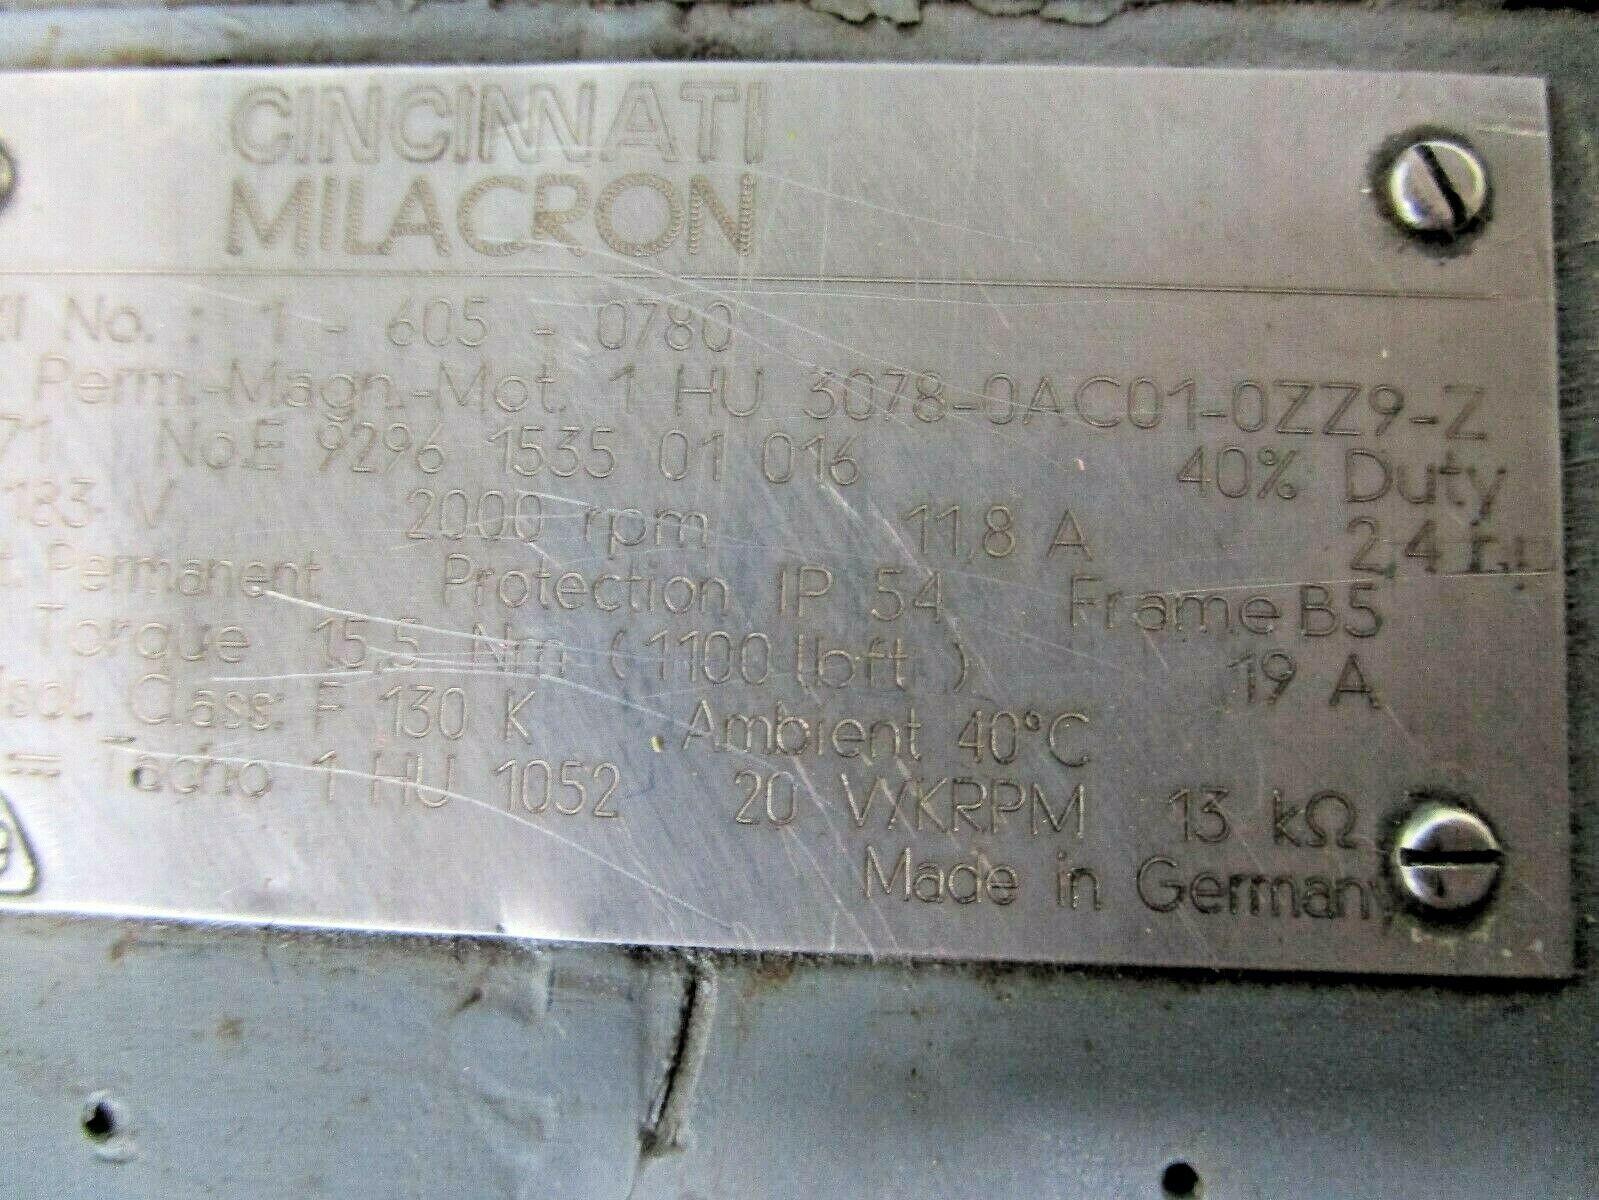 Siemens Servo Motor 1HU3078-0AC01-0ZZ9-Z Cincinnati Milacron Part# 1-605-0780